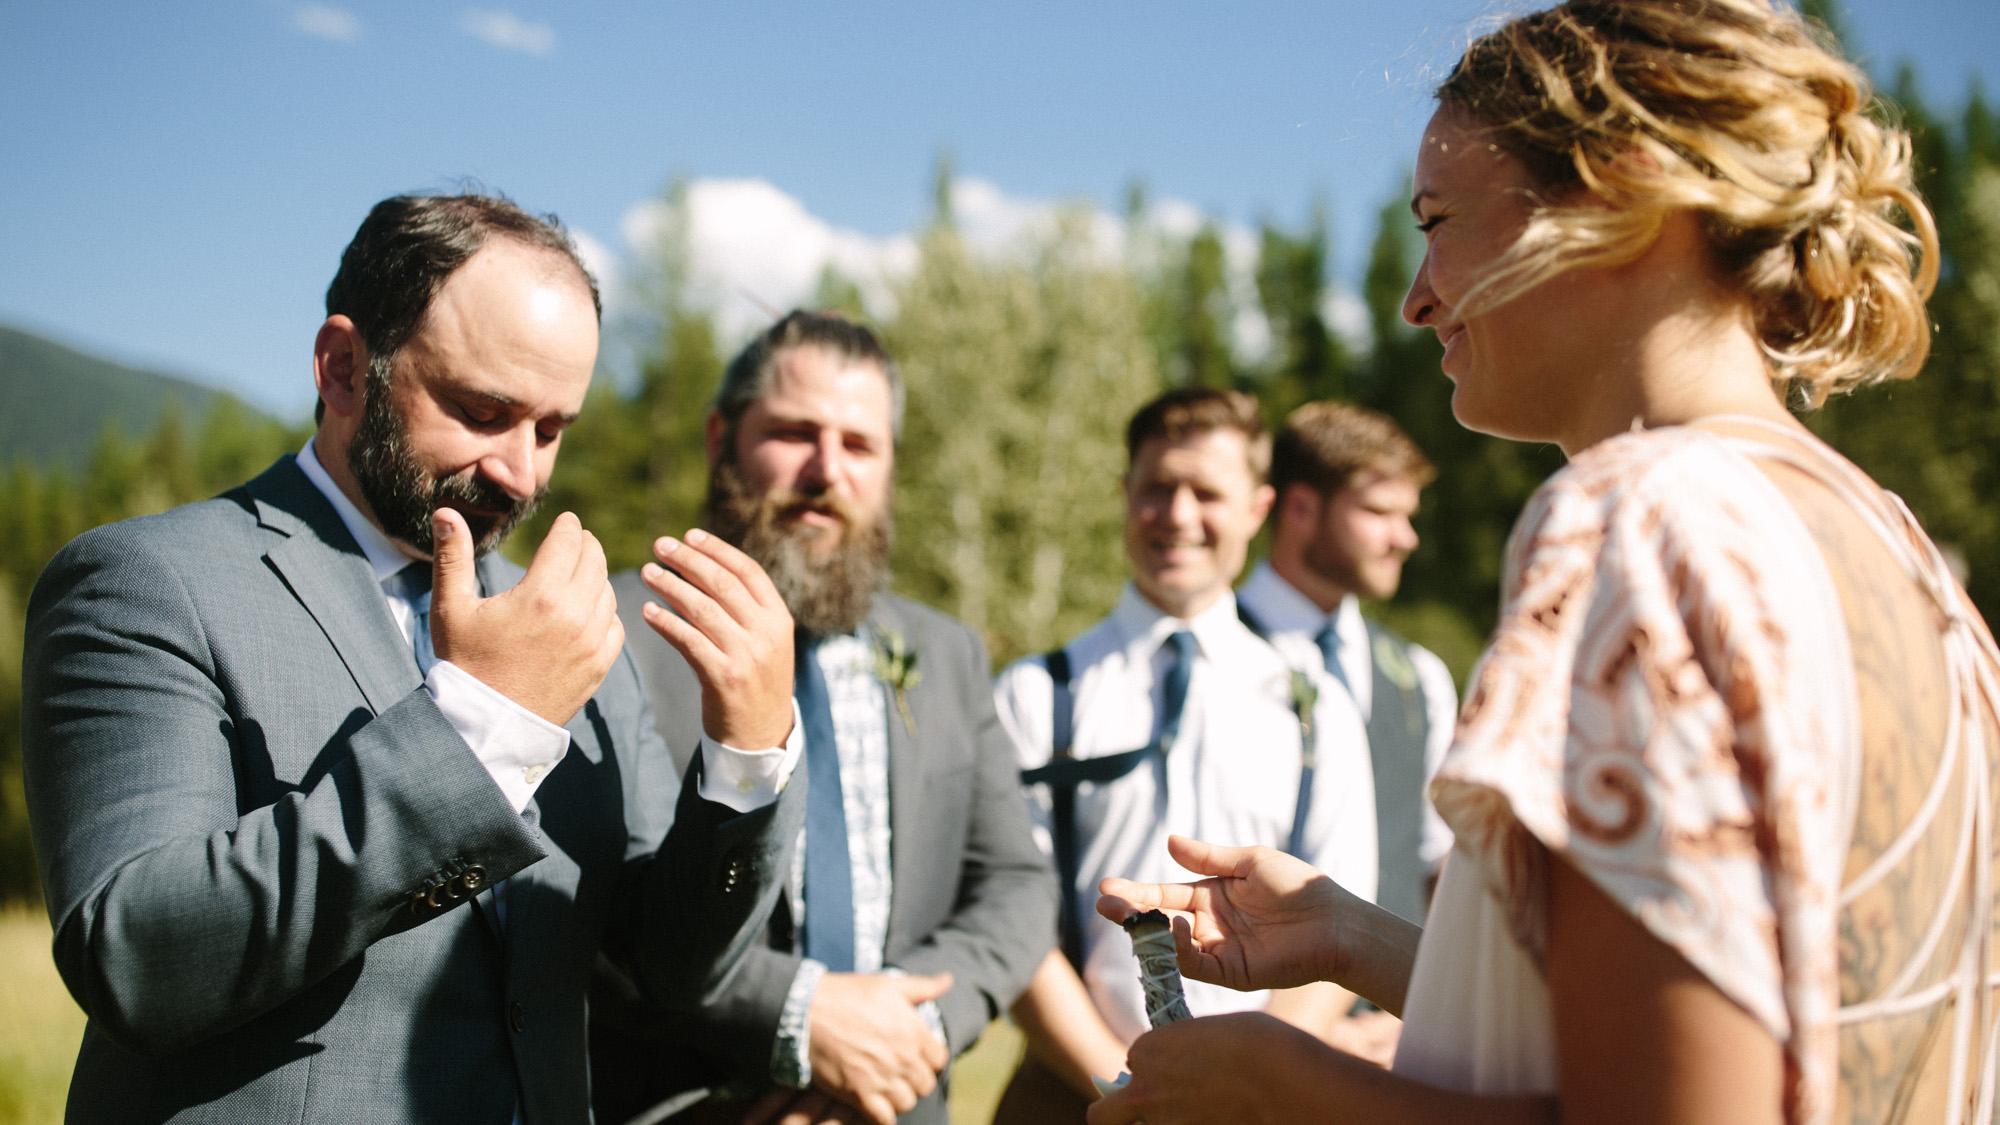 Montana_Wedding_Photos_alec_vanderboom-0083.jpg